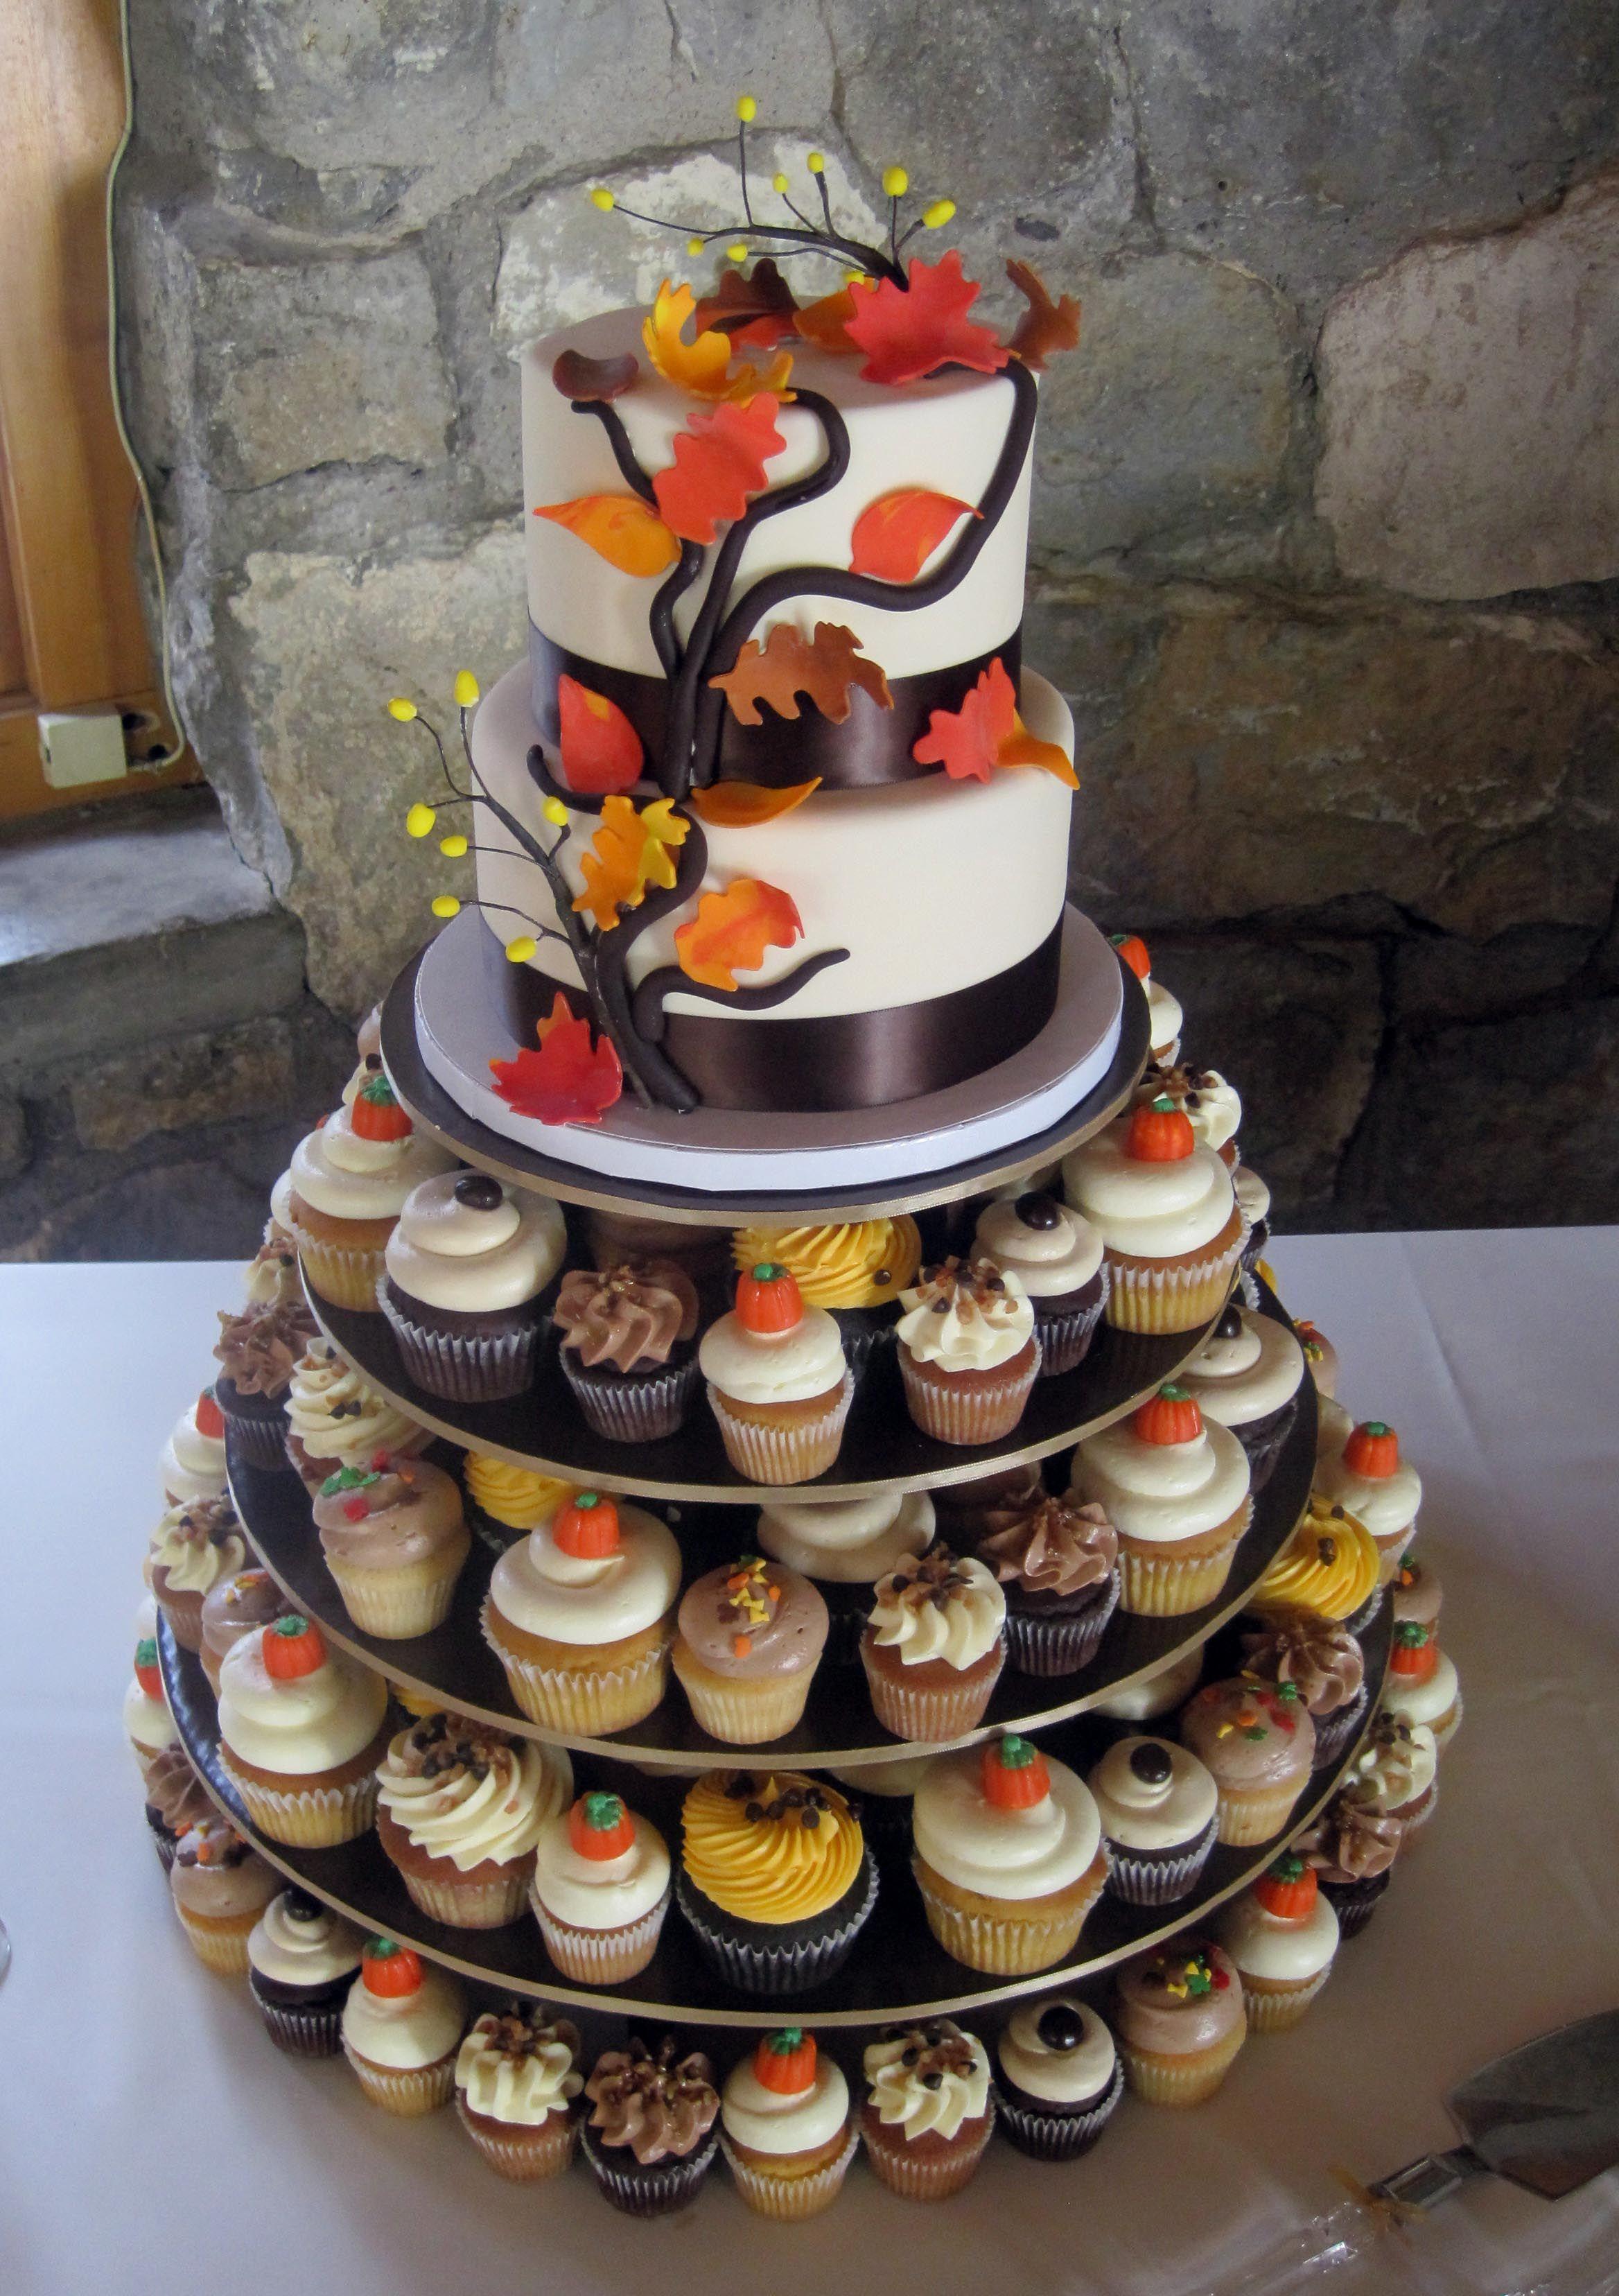 2 Tier Autumn Cutting Cake Amp Assorted Cupcakes